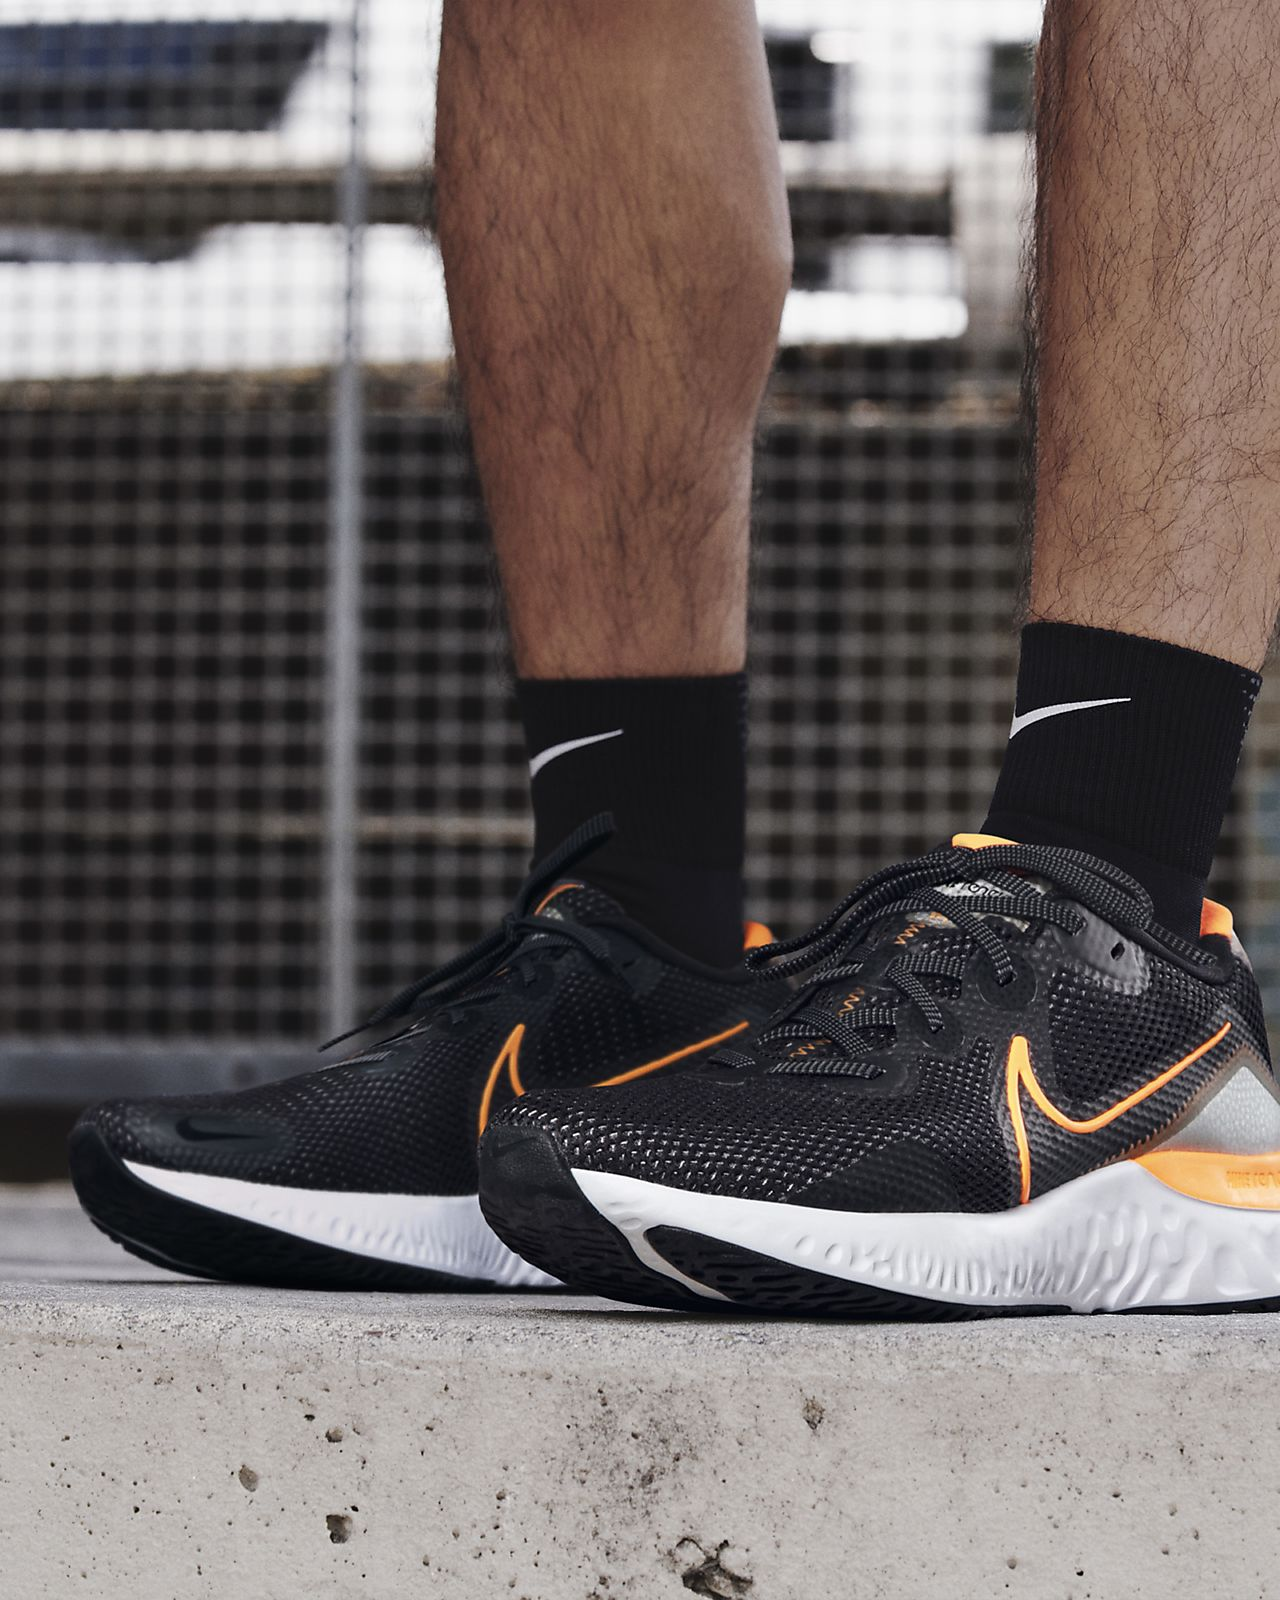 Nike Renew Run scarpe da ginnastica ragazza |